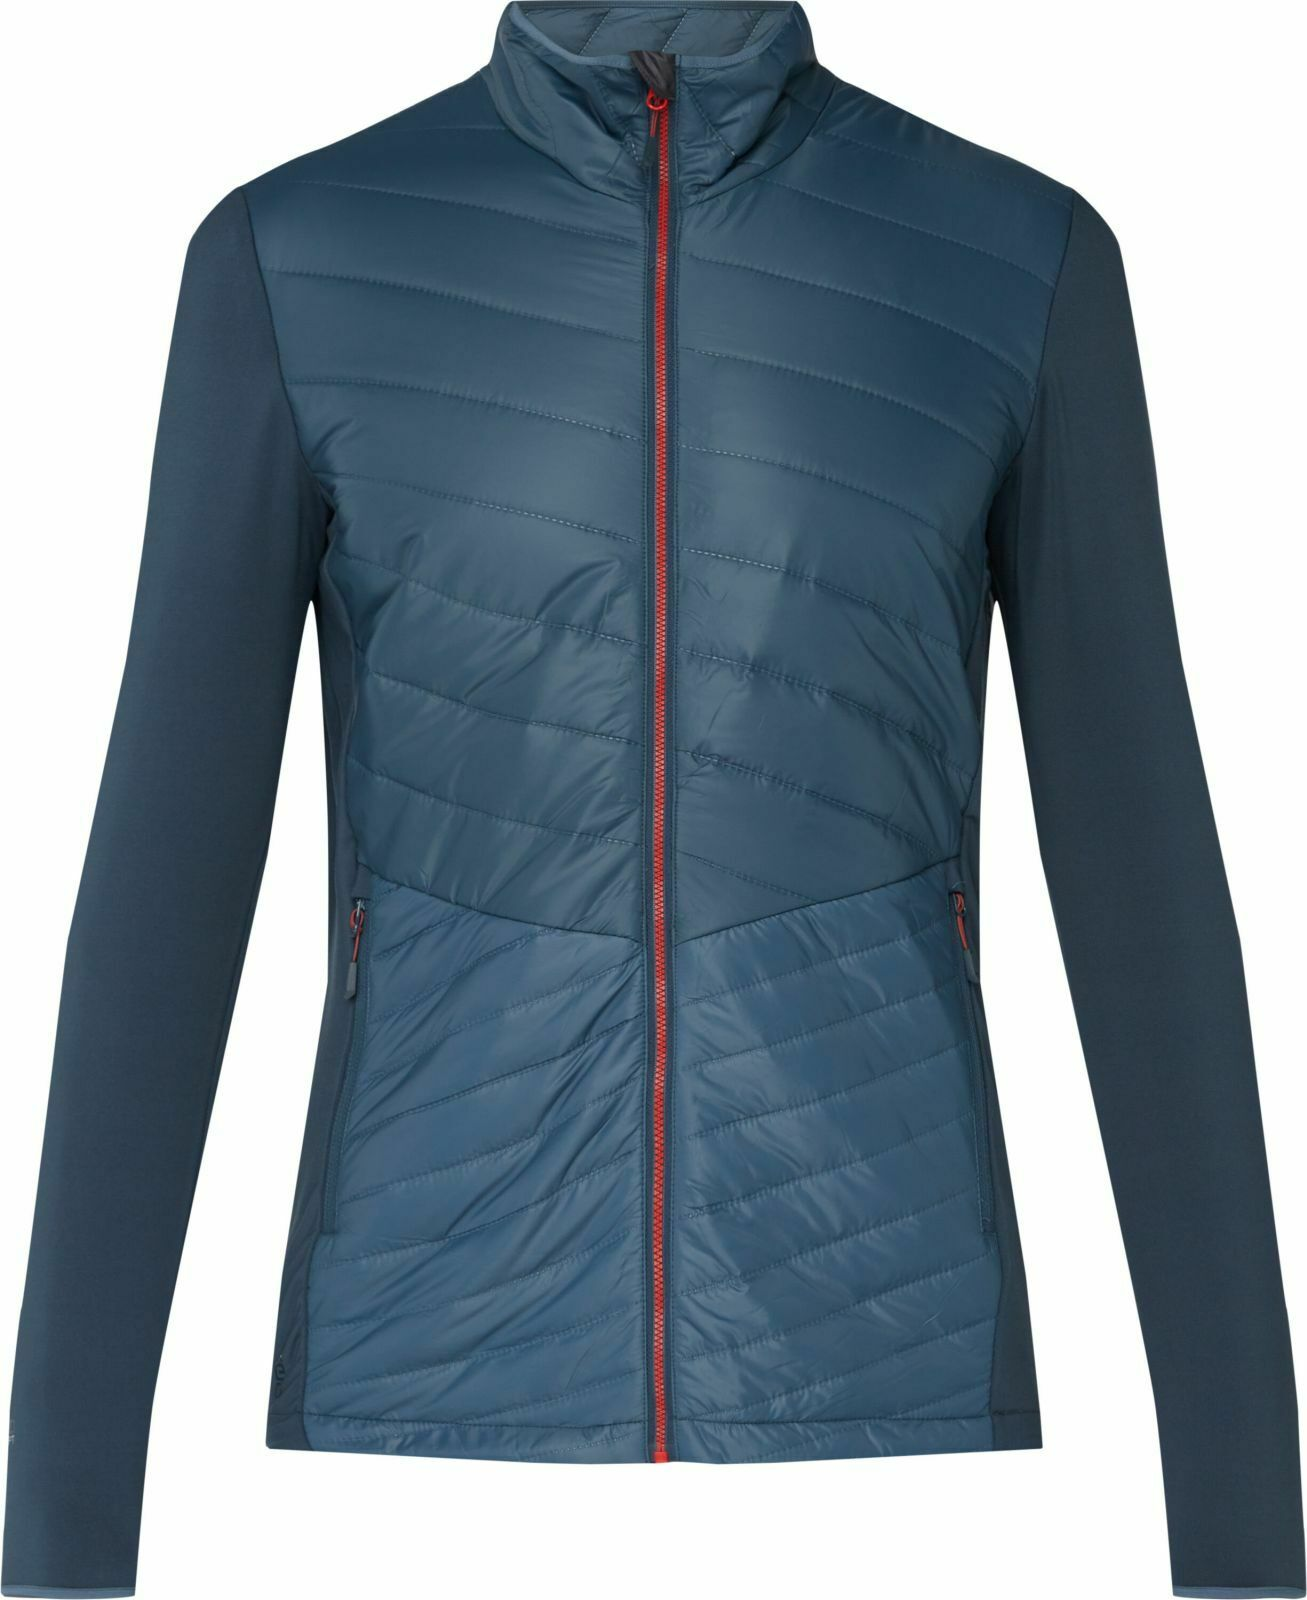 McKinley Herren Outdoor Freizeit Jacke Hybridjacke Rubito navy blau